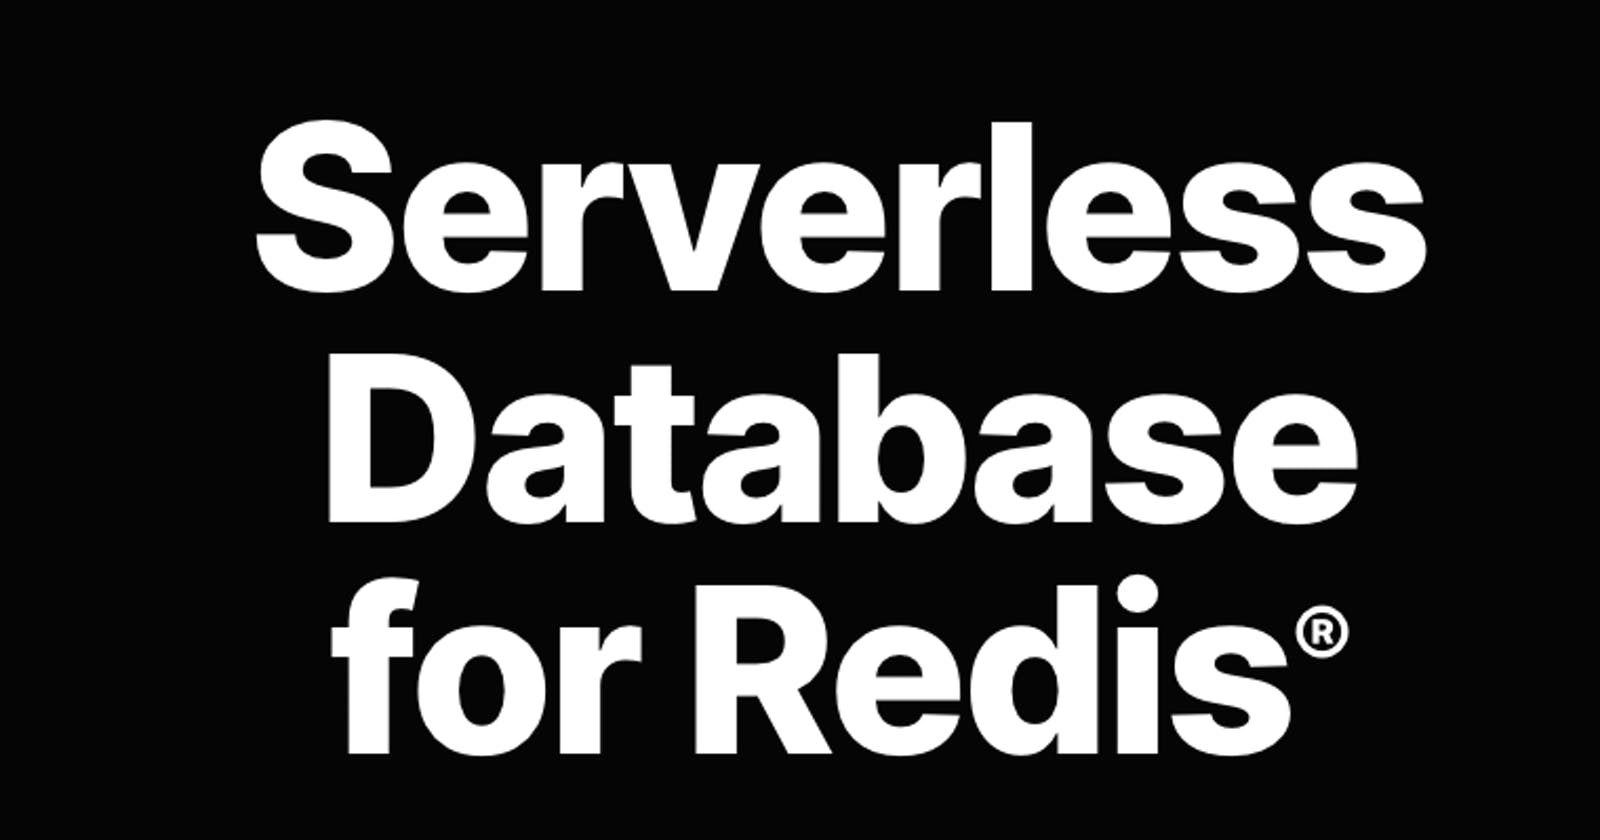 Using Serverless Redis as Database for Netlify Functions